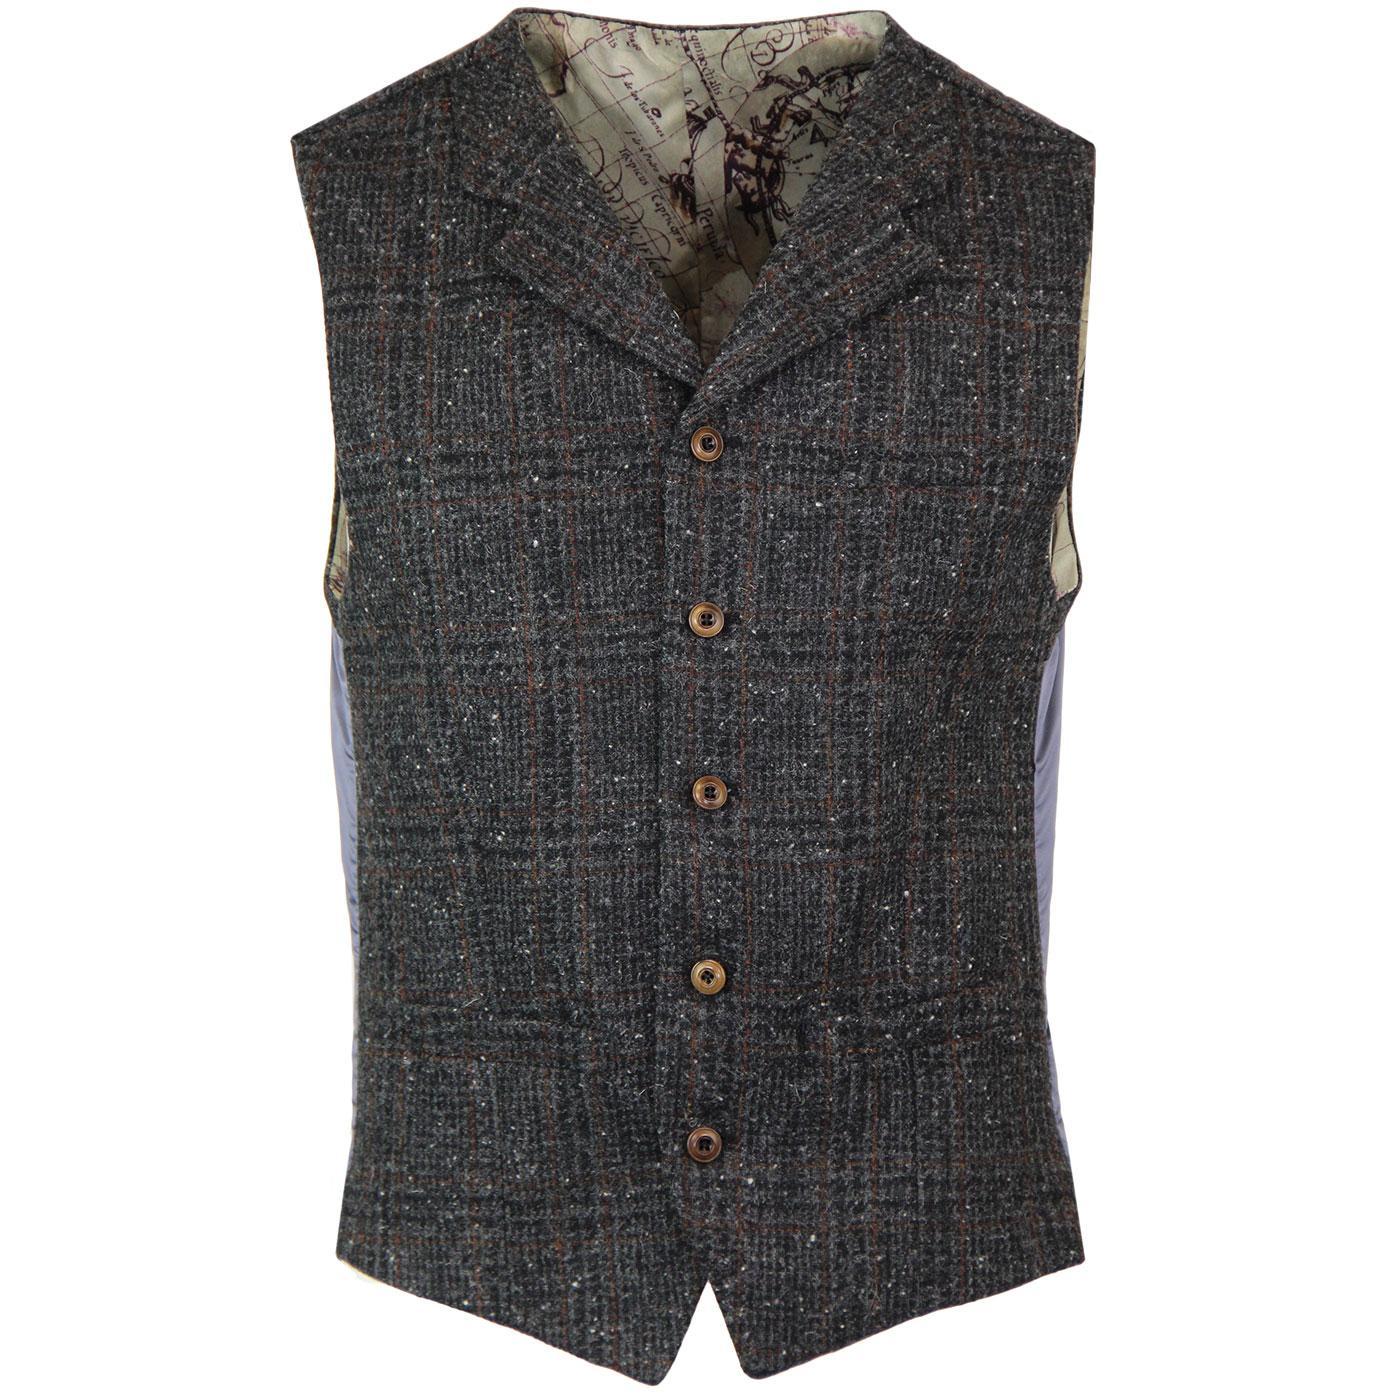 GIBSON LONDON Mod Glen Check Lapel Waistcoat (C)